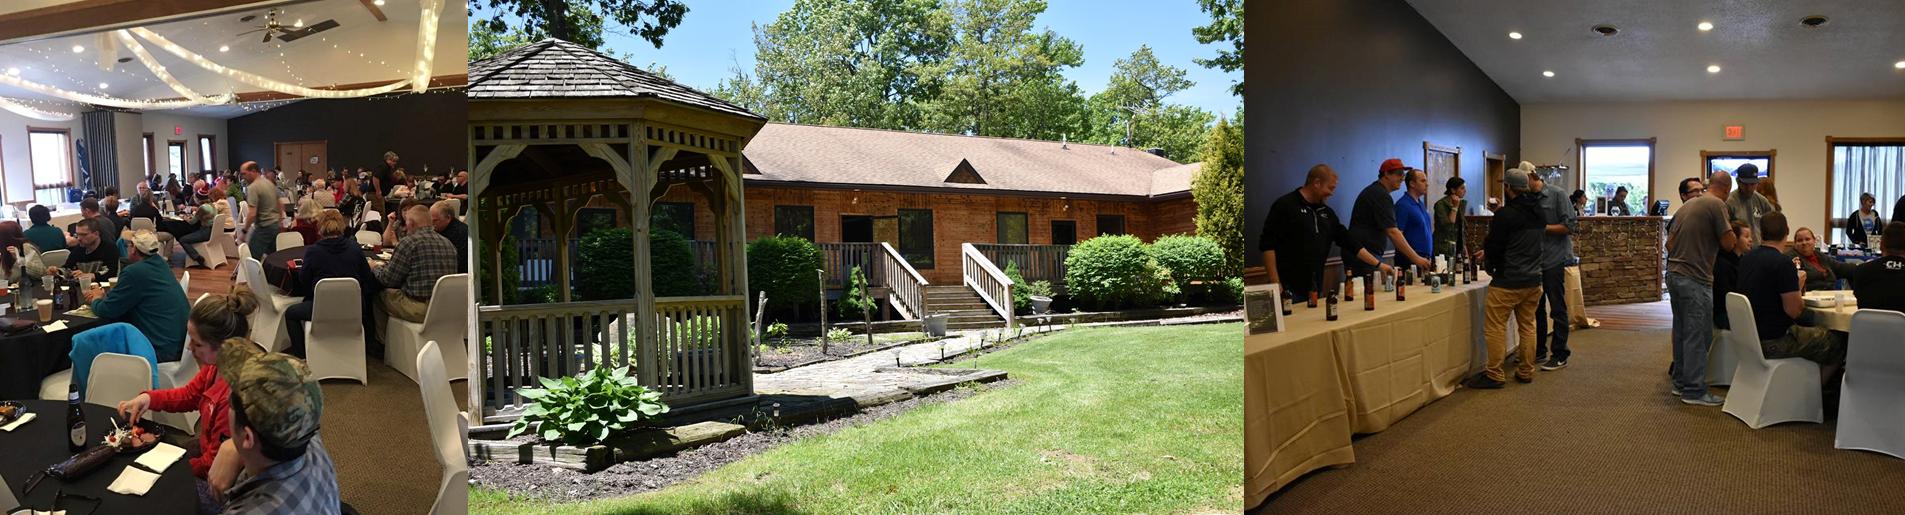 Visit Johnstown Pa | Blue Knob Conference Center